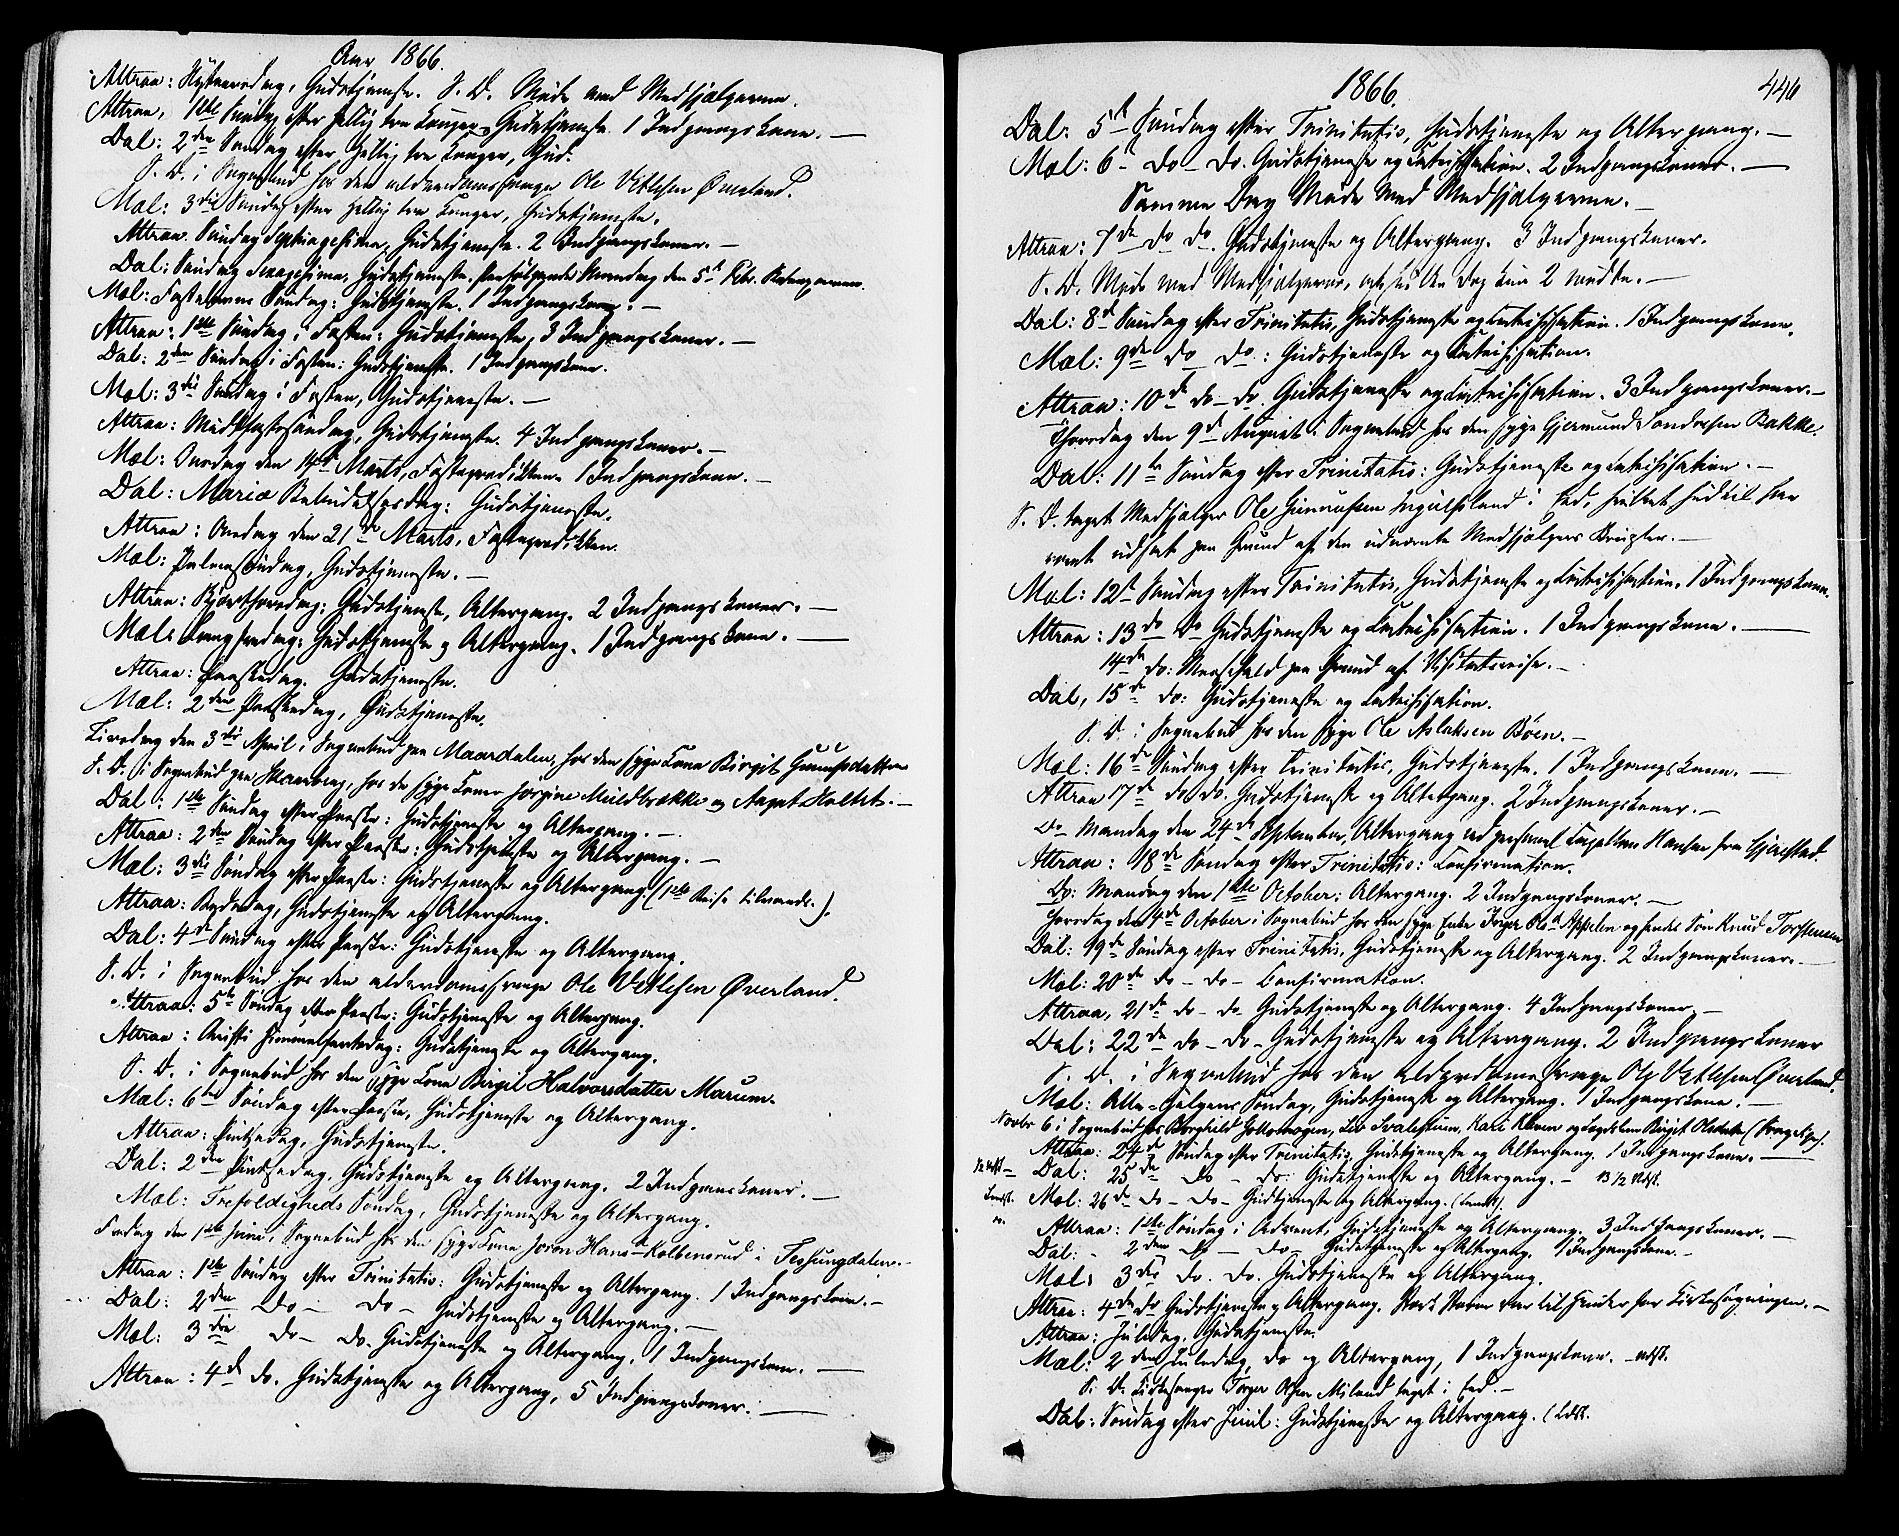 SAKO, Tinn kirkebøker, F/Fa/L0006: Ministerialbok nr. I 6, 1857-1878, s. 446